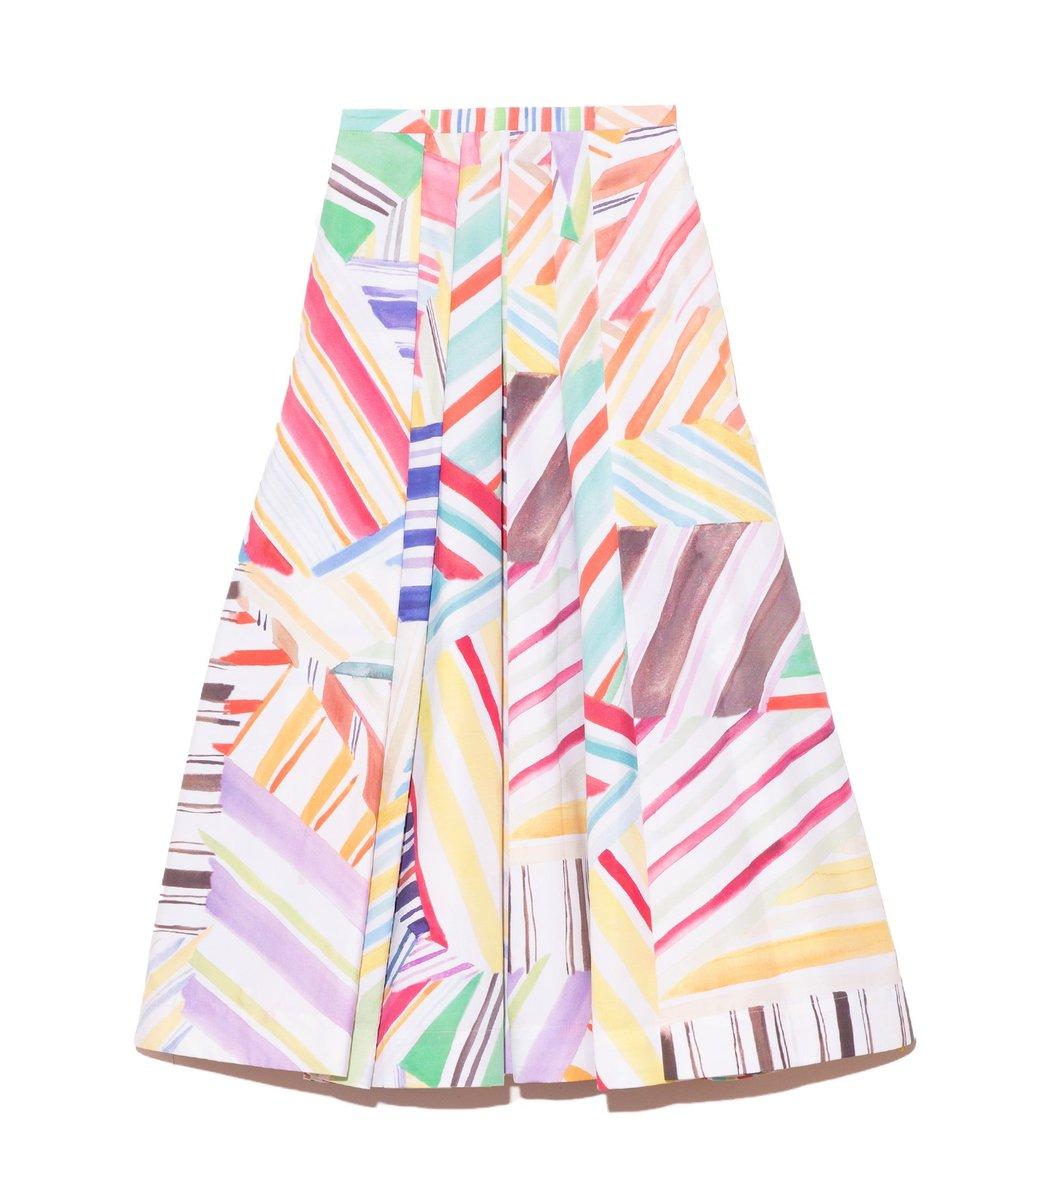 Rosie Assoulin Pleated Skirt in Rainbow